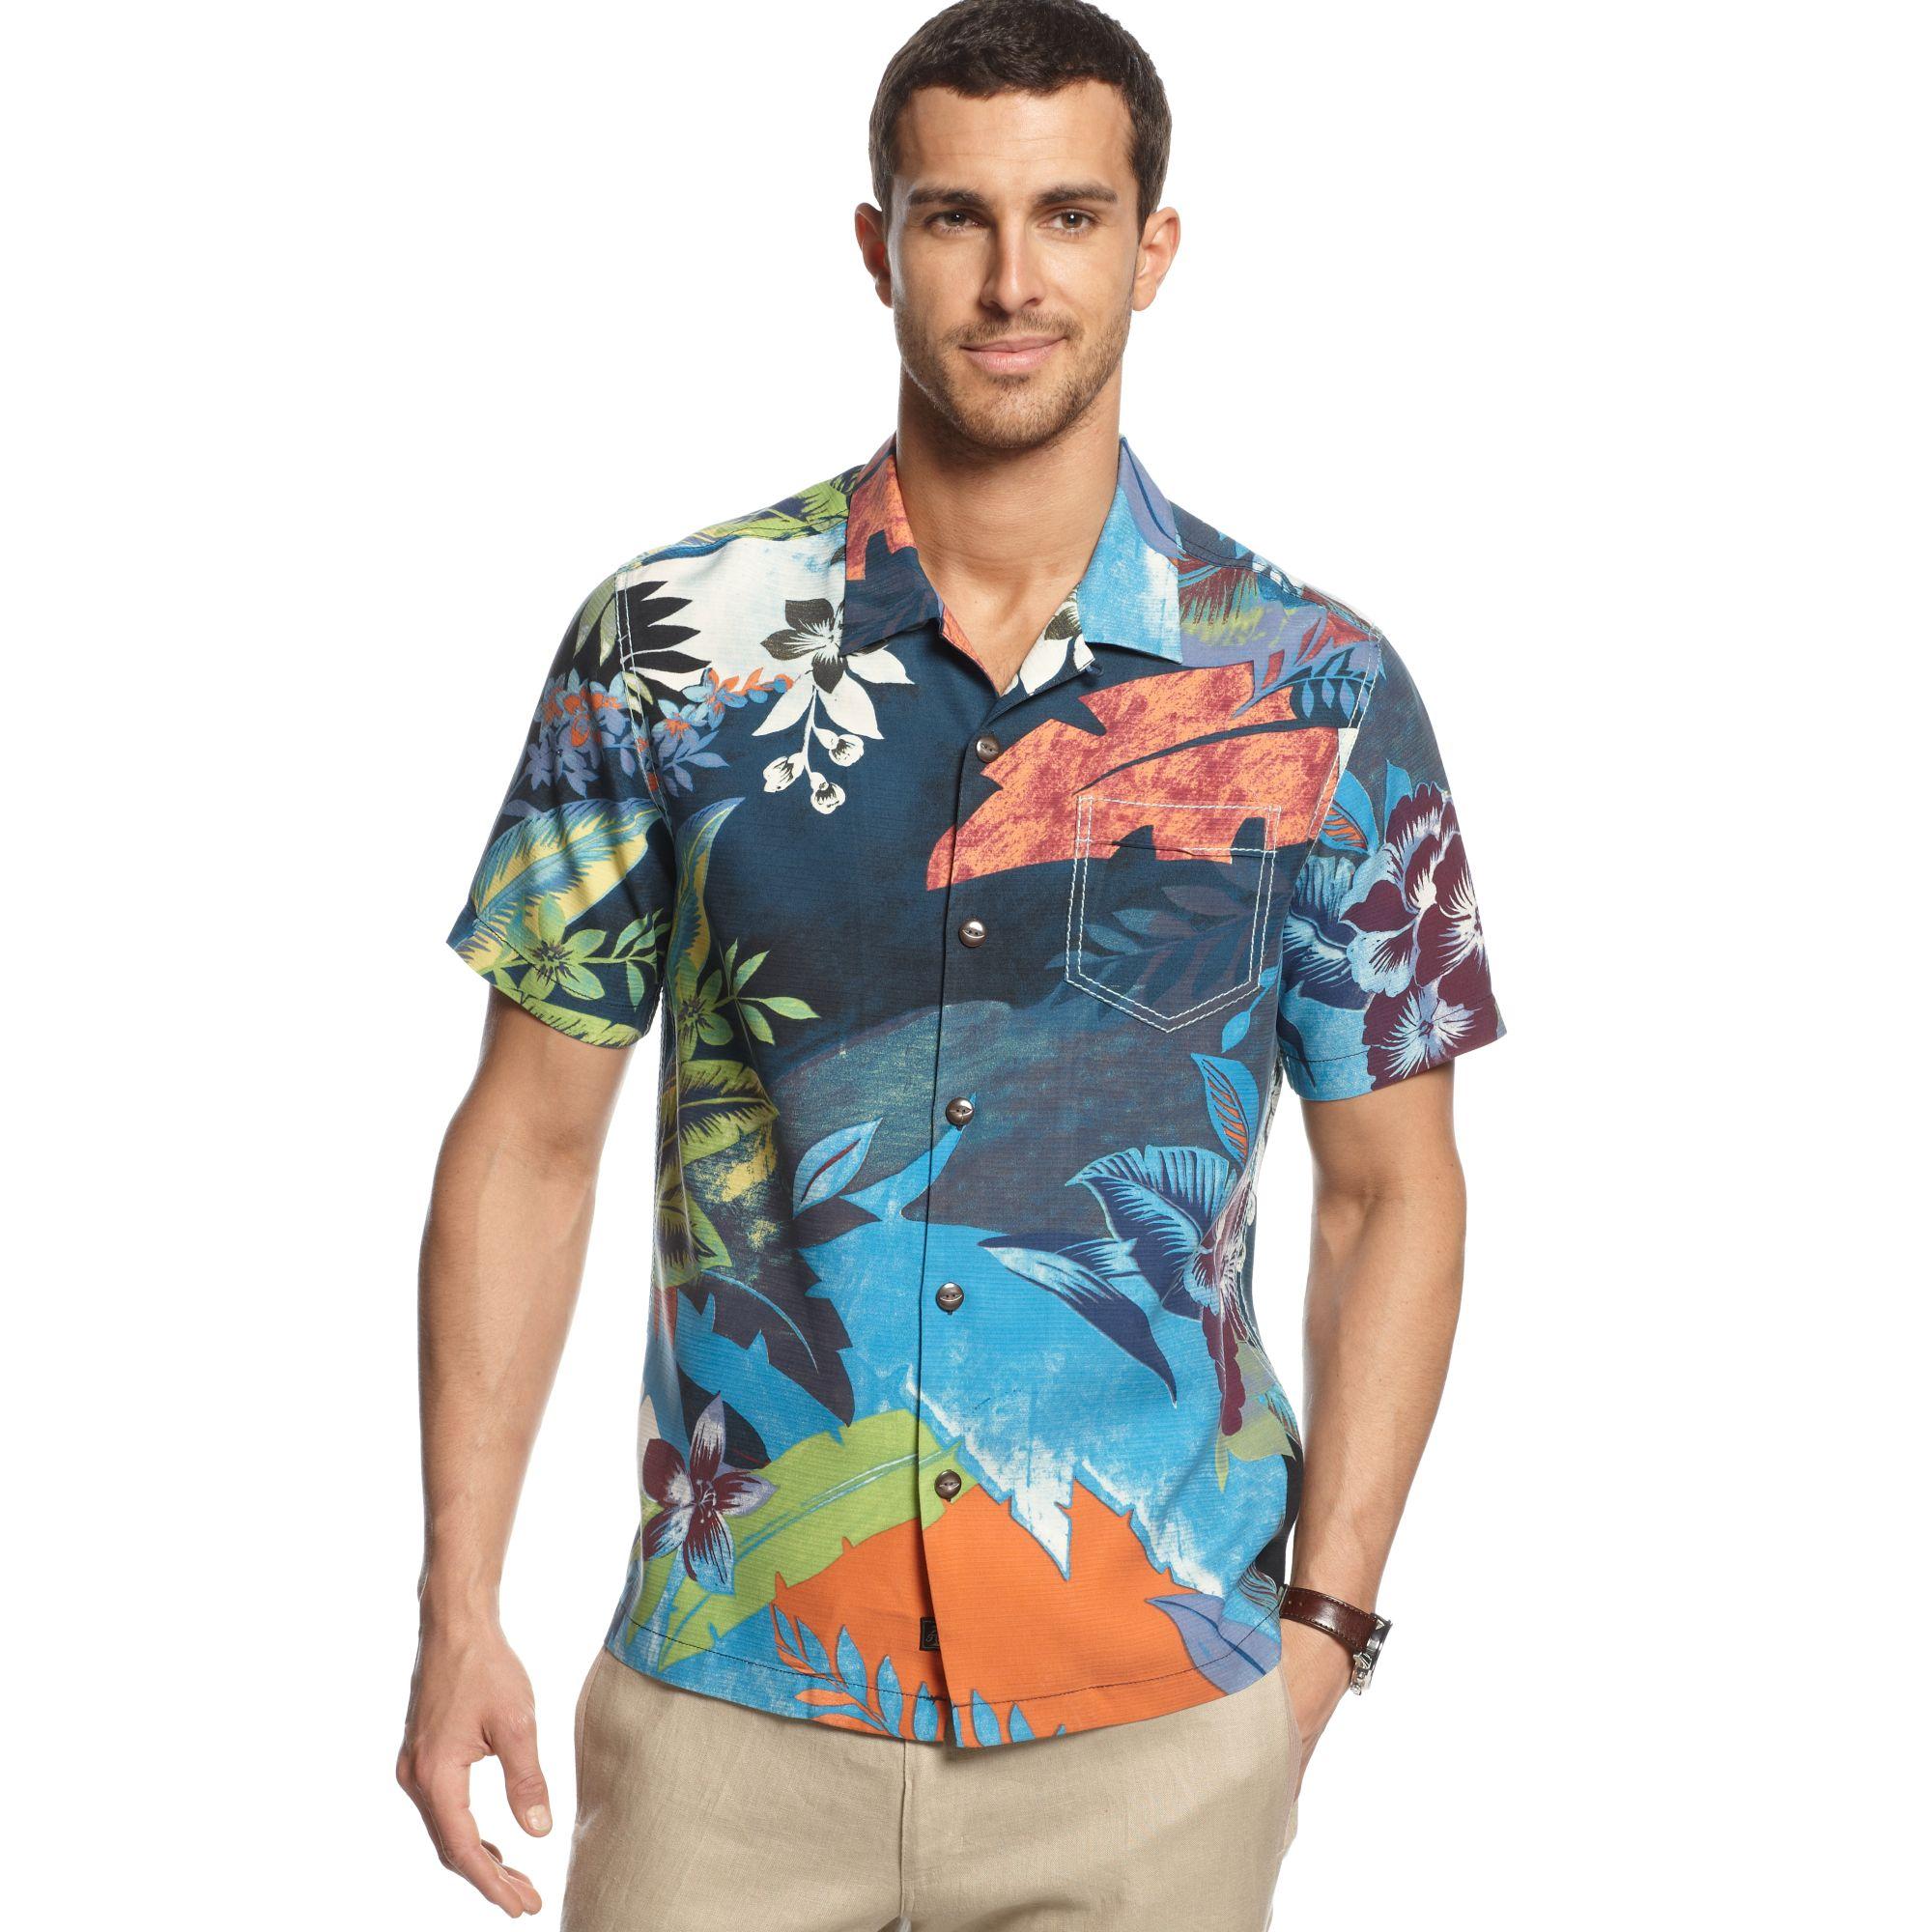 Tommy Bahama Mediterranean Blooms Short Sleeve Shirt In